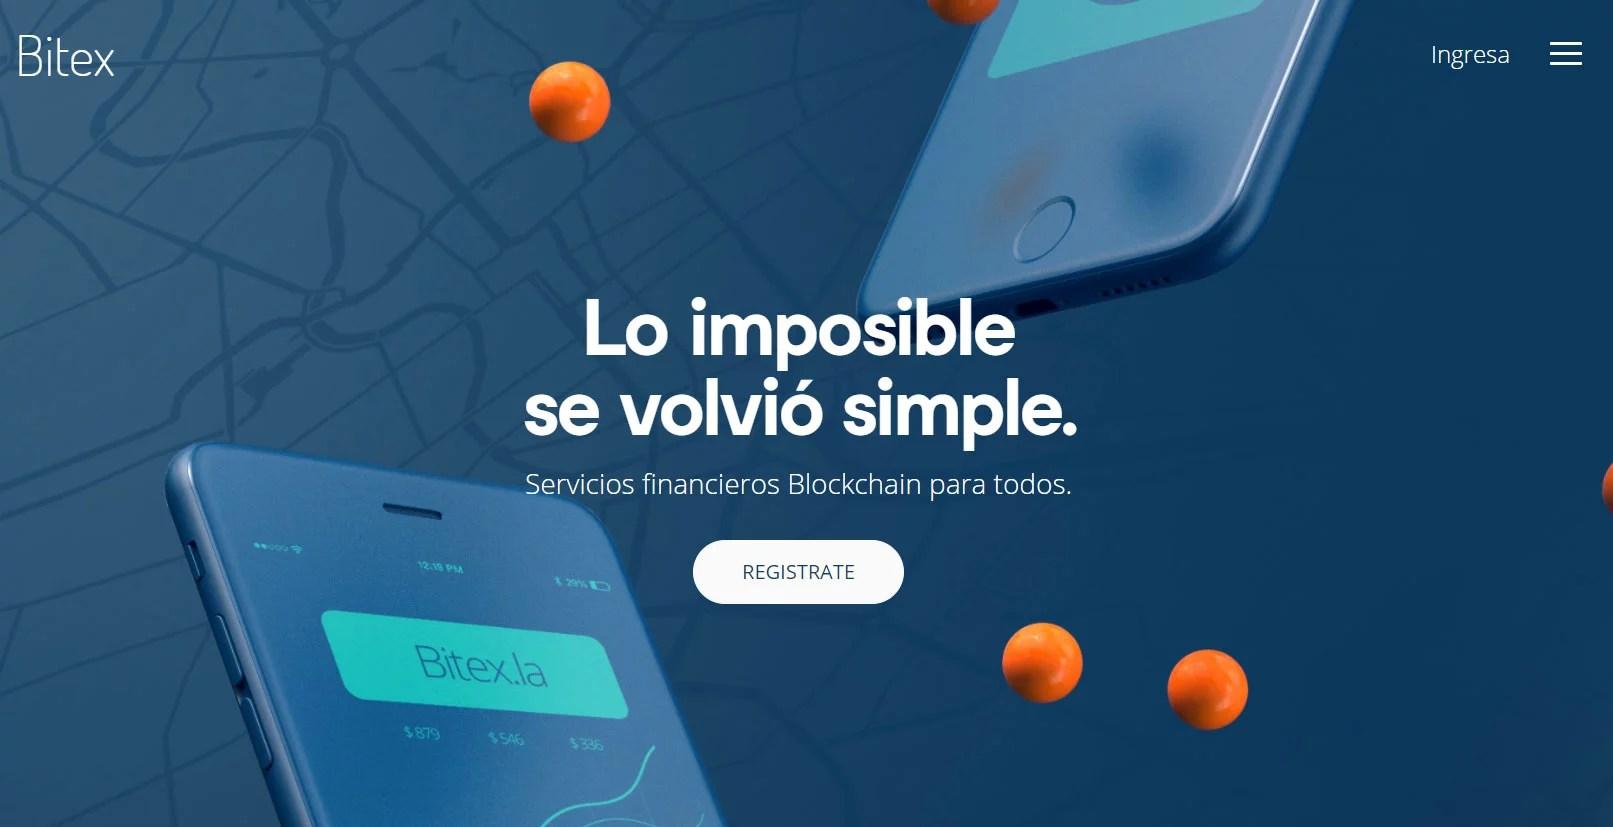 BITEX para comprar BTC con pesos argentinos